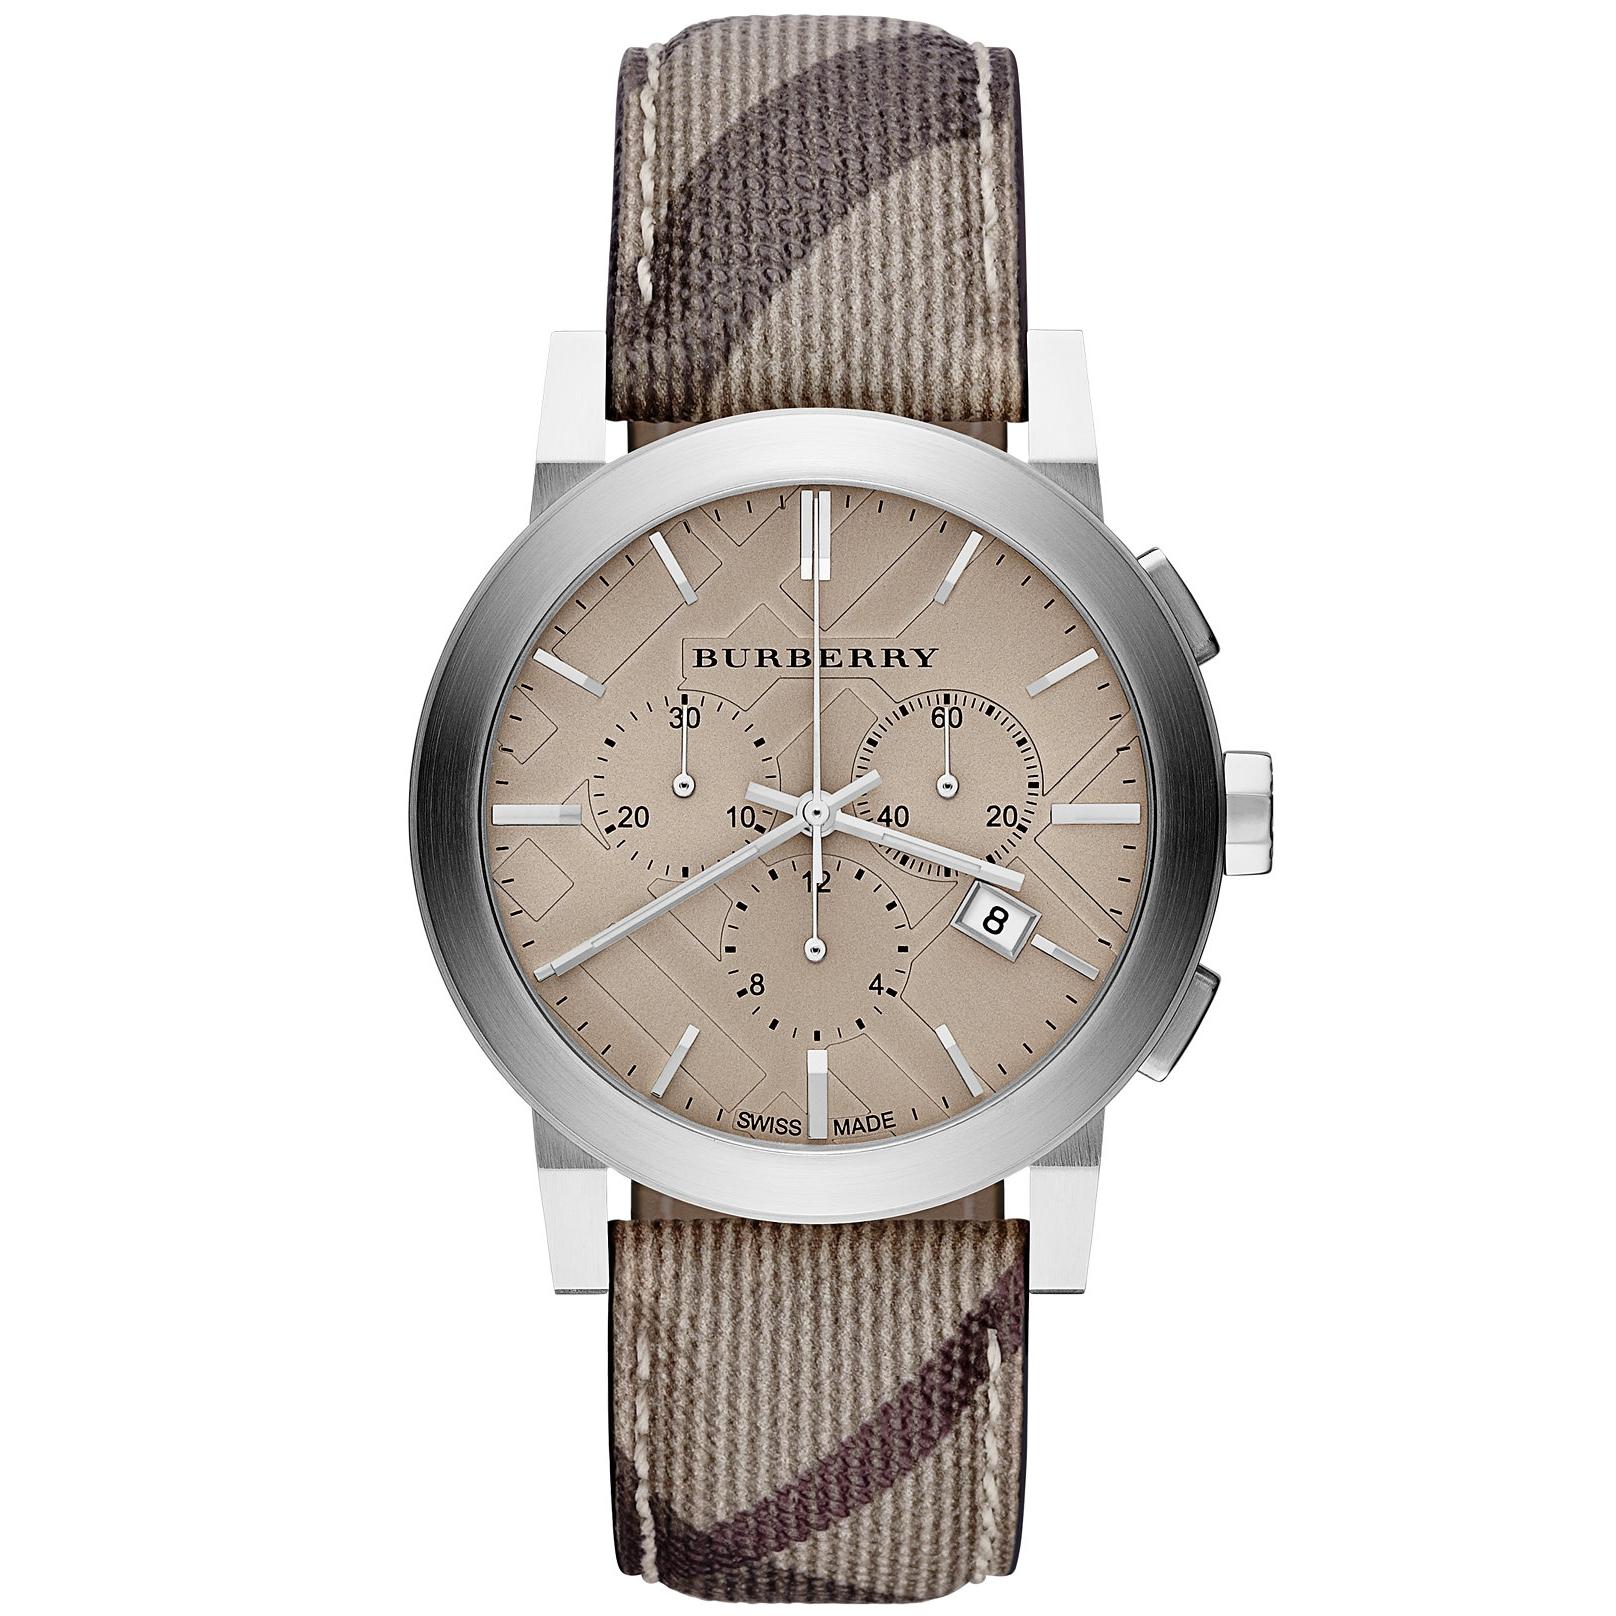 Orologio cronografo uomo Burberry BU9361